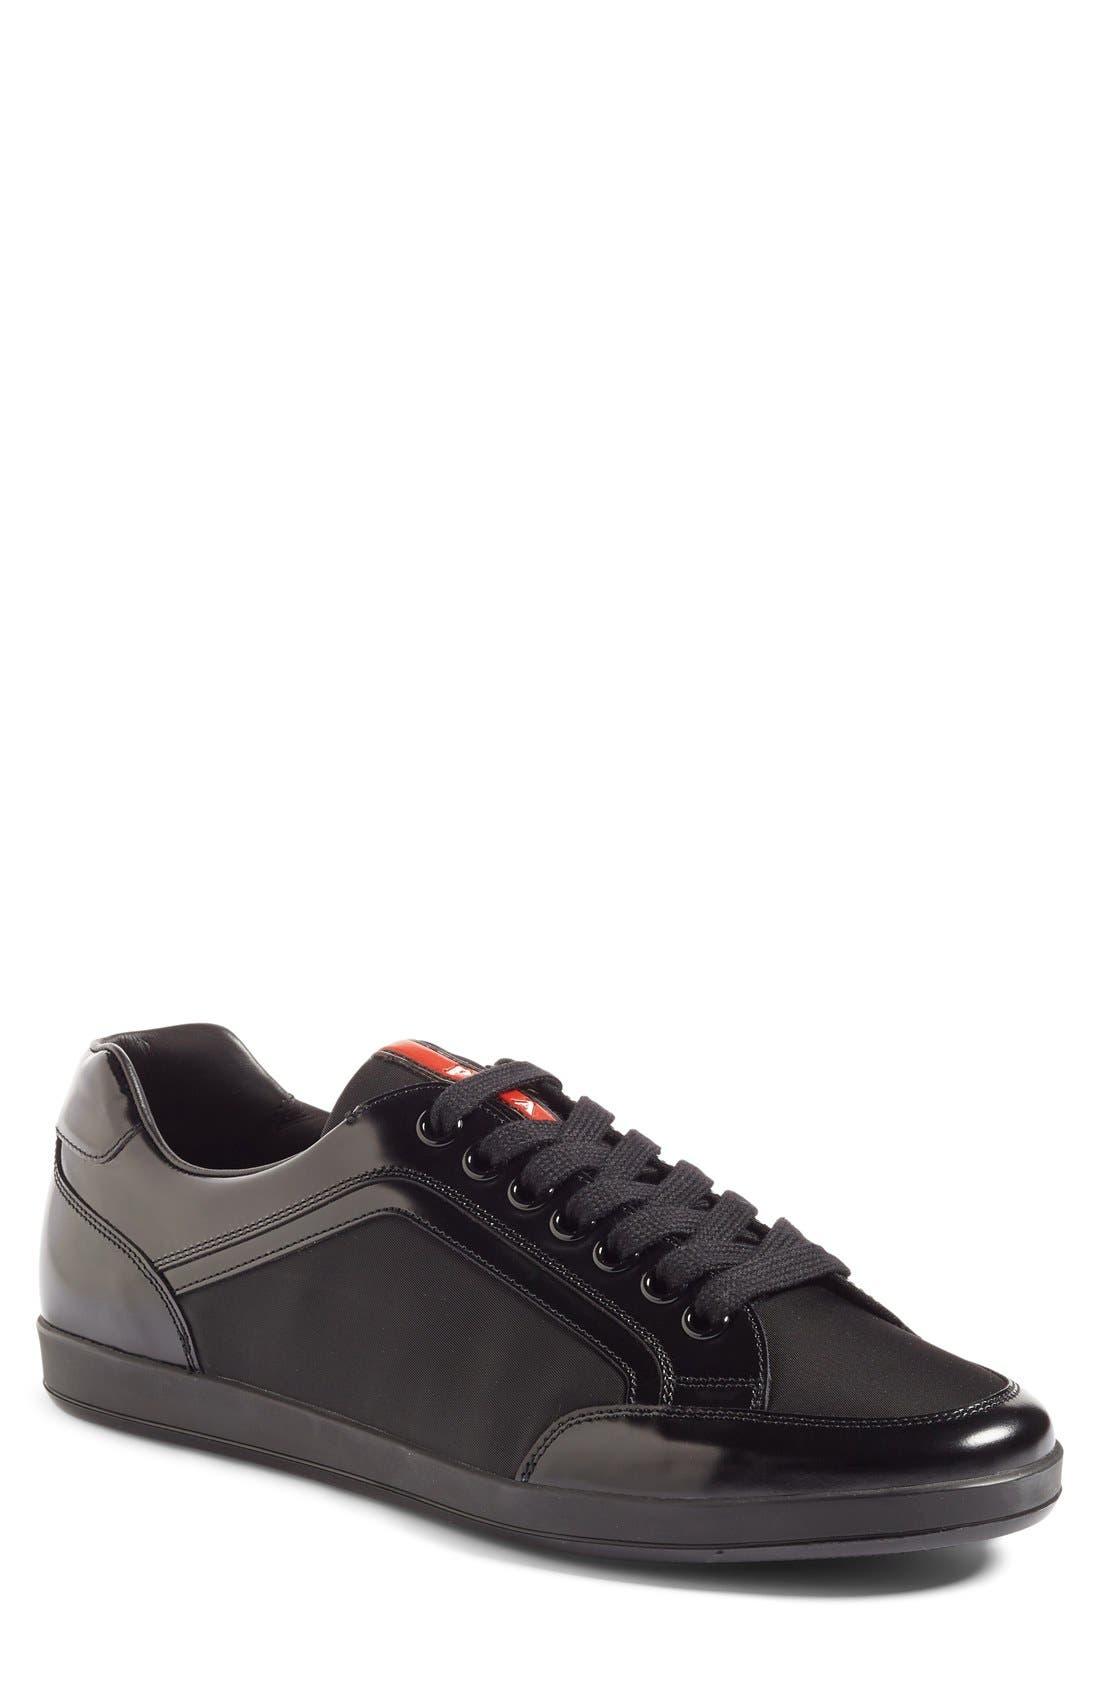 Linea Rossa Sneaker,                         Main,                         color, 001